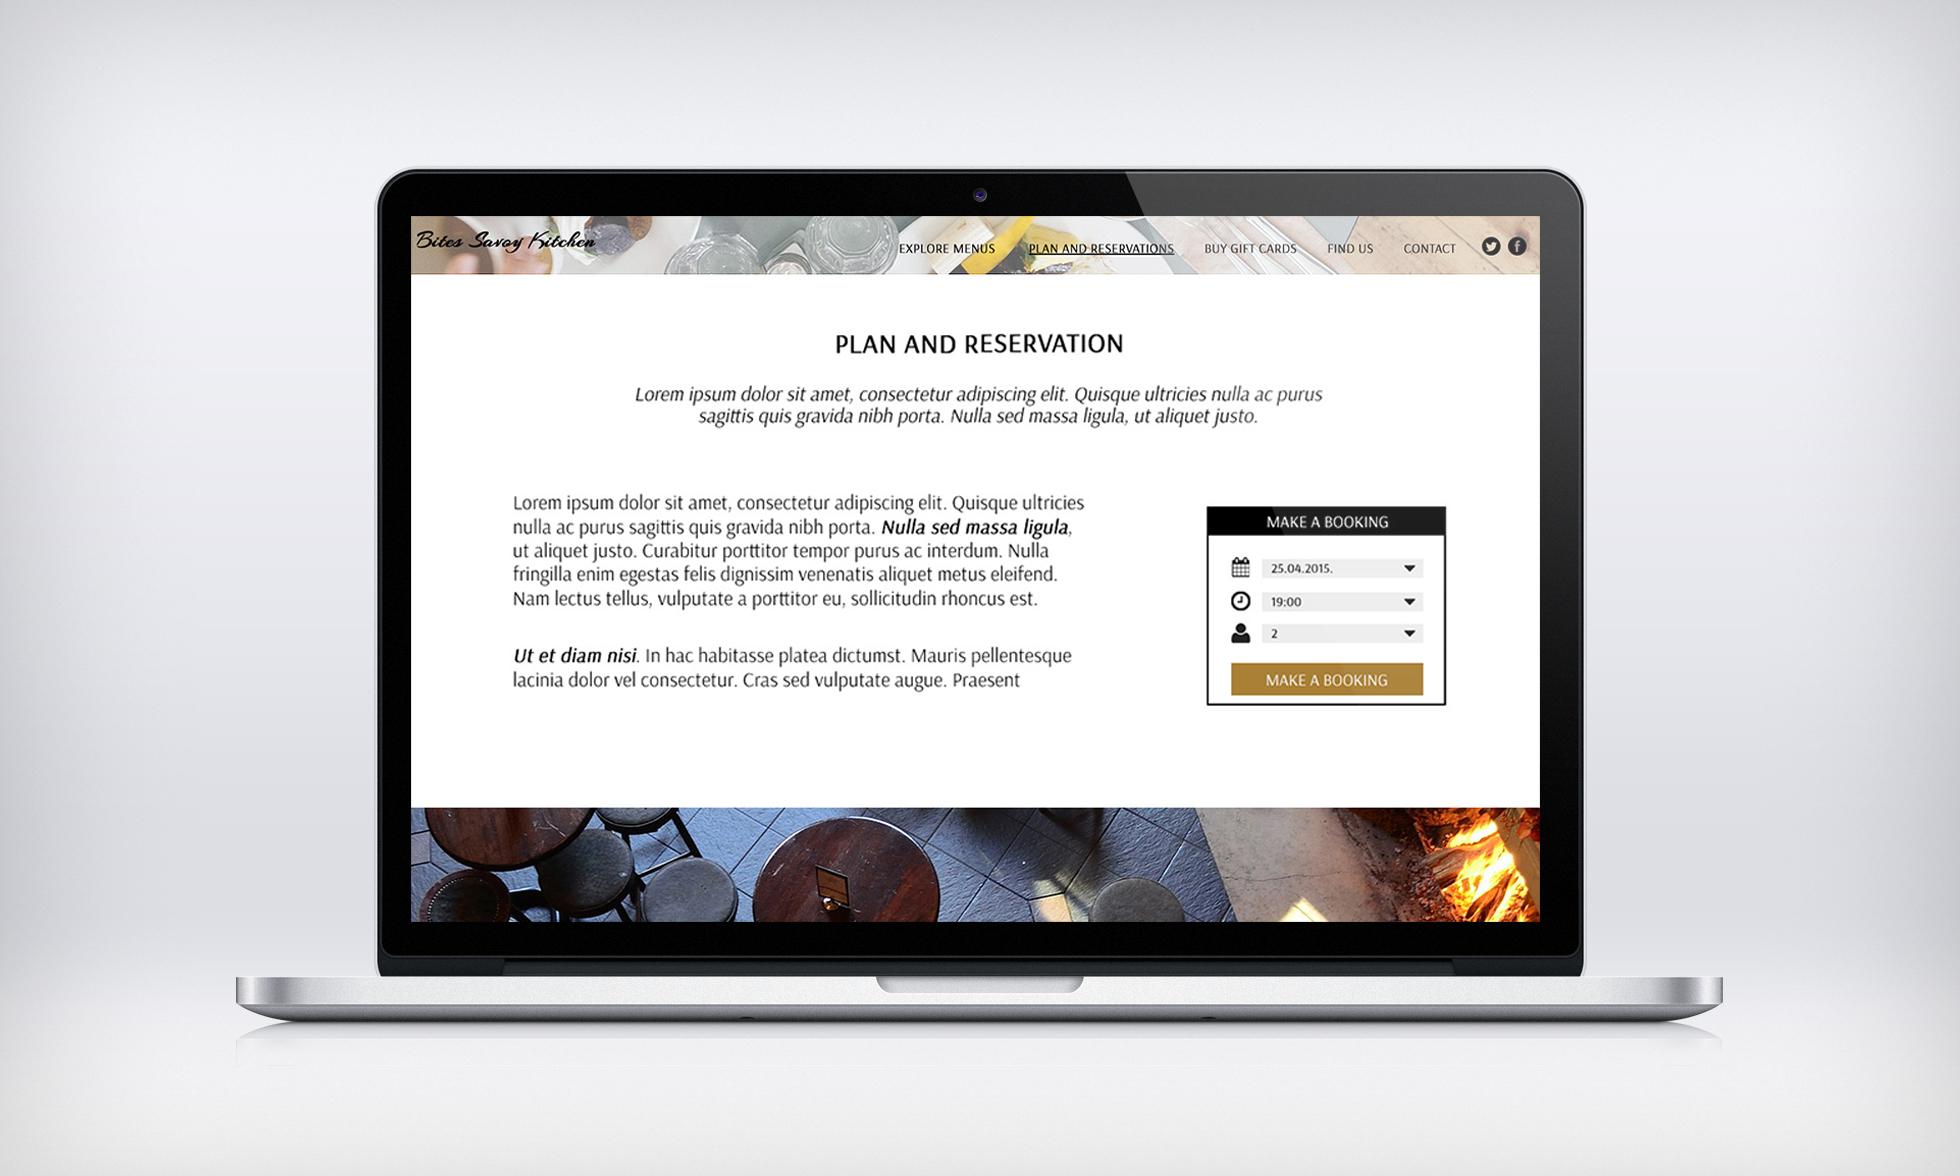 Restaurant with reservation website design | One page site design